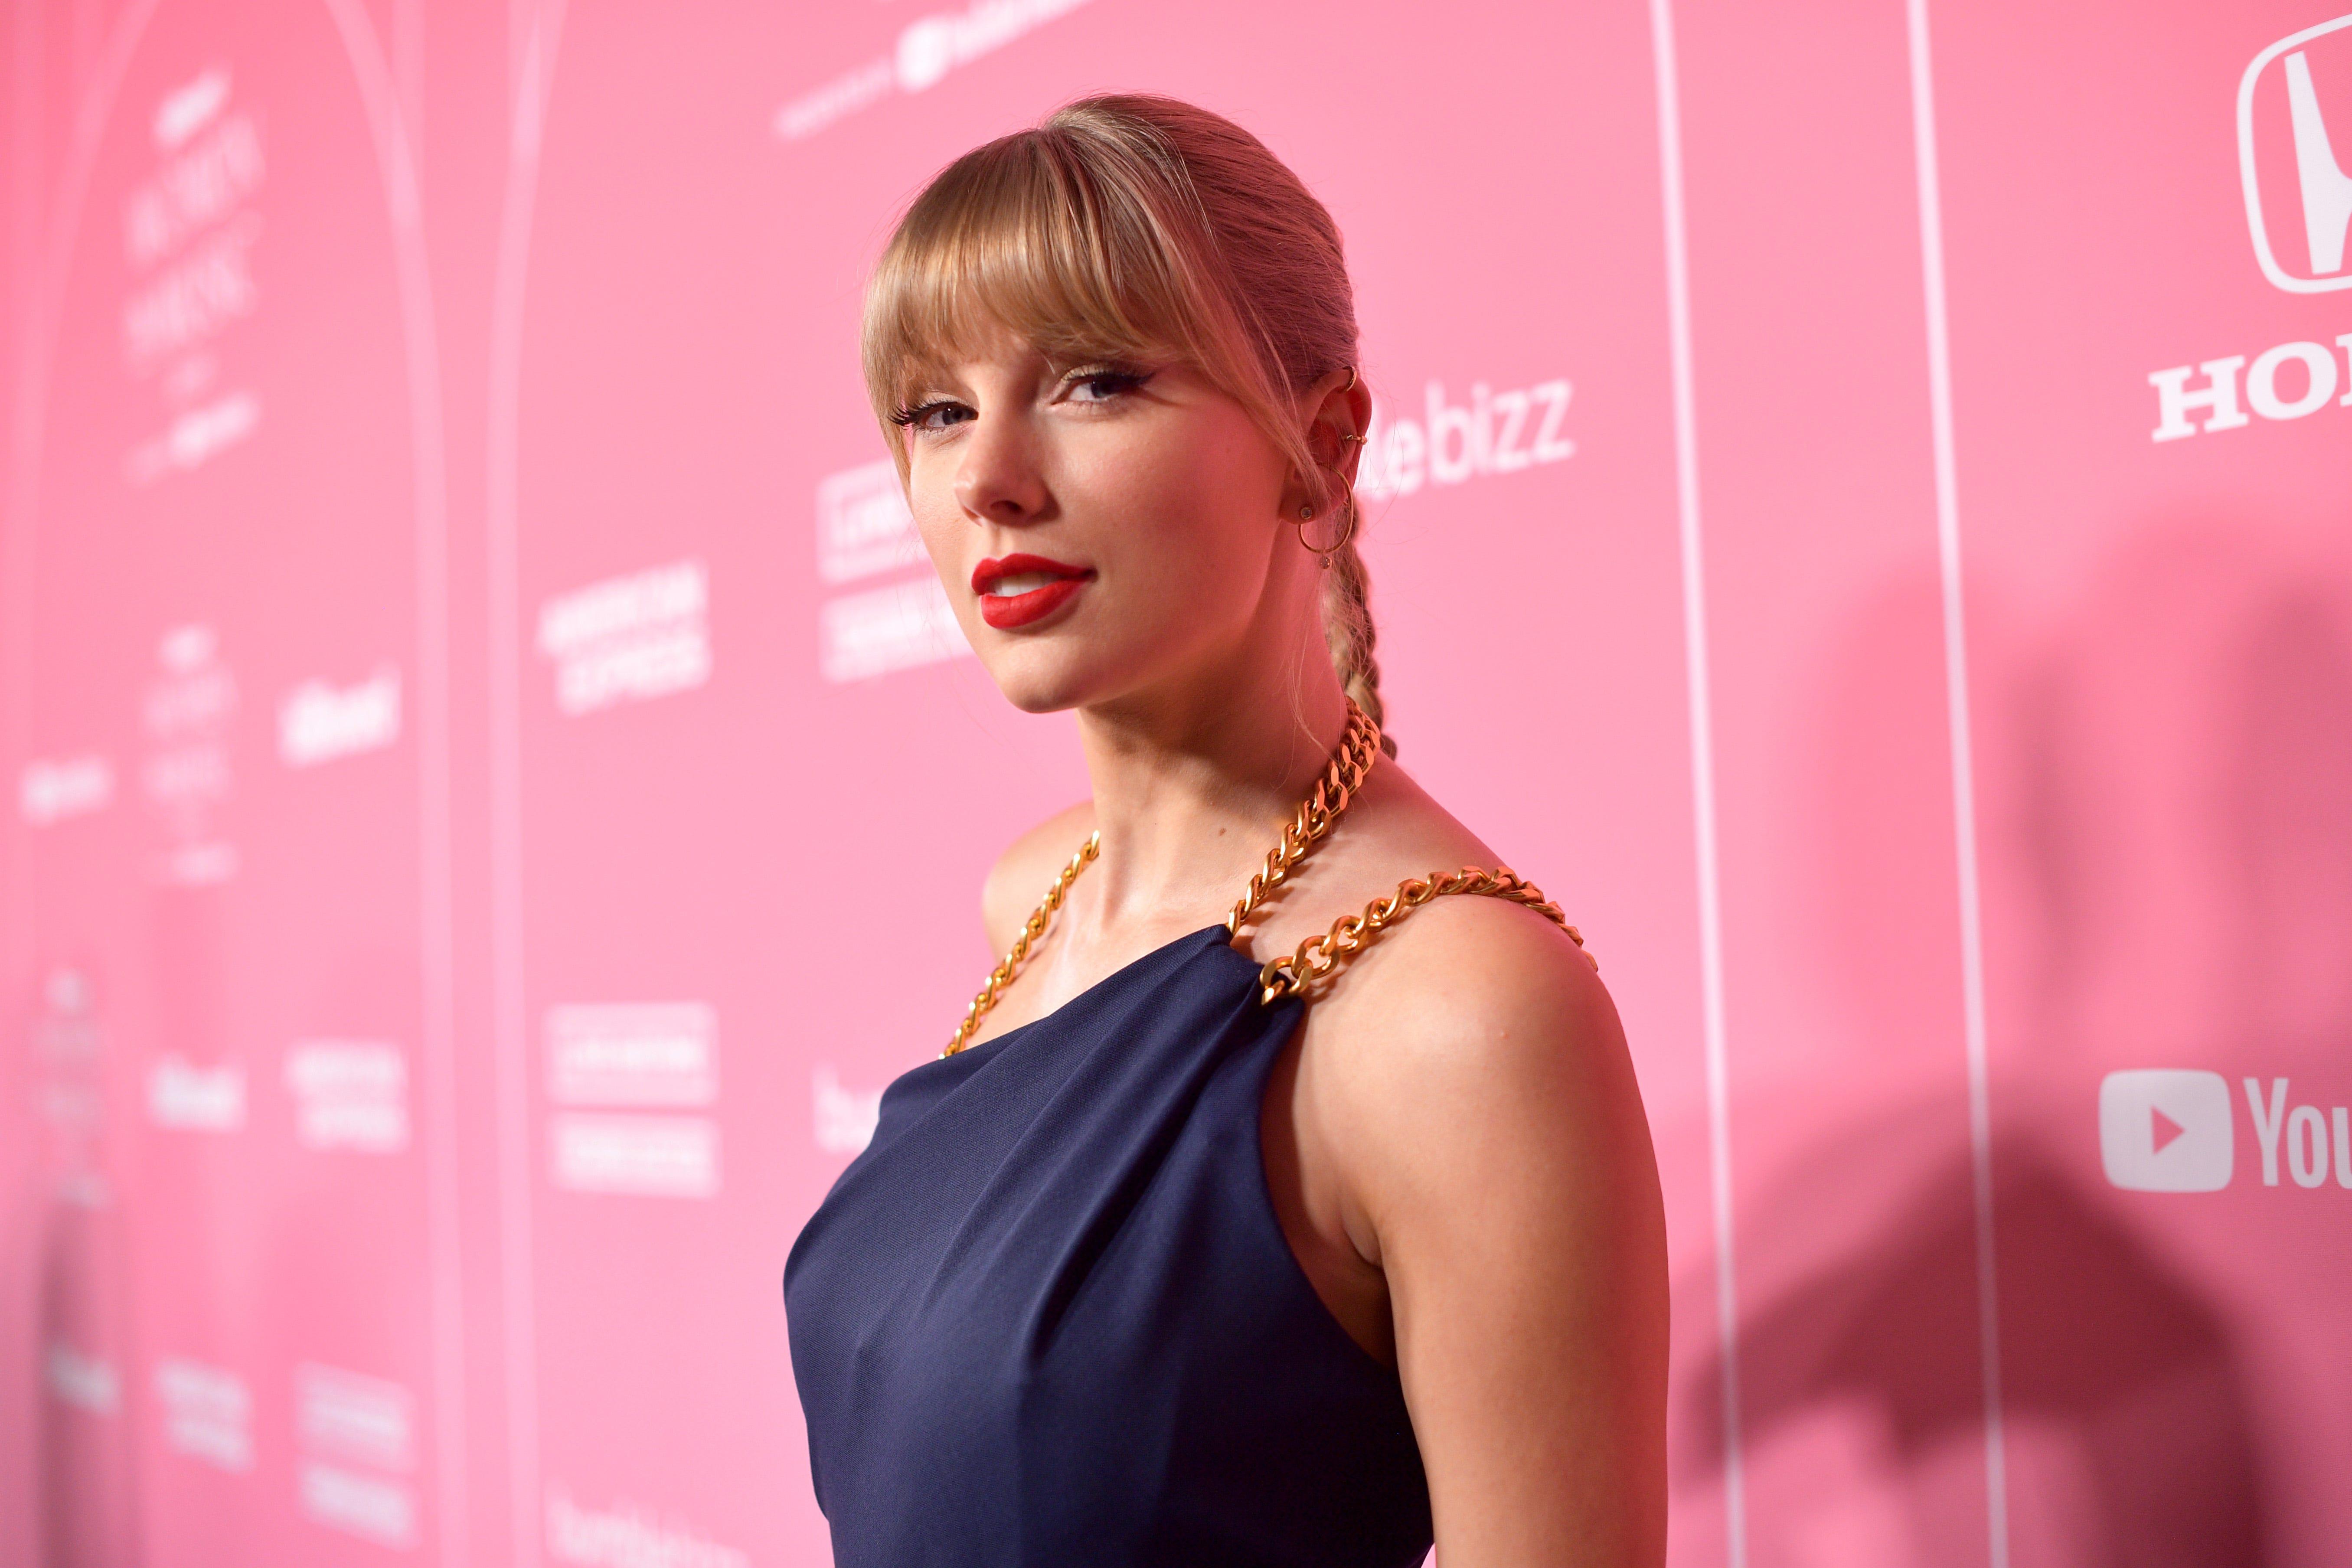 Taylor Swift slams 'toxic male privilege,' Scooter Braun in Billboard Woman of the Decade speech